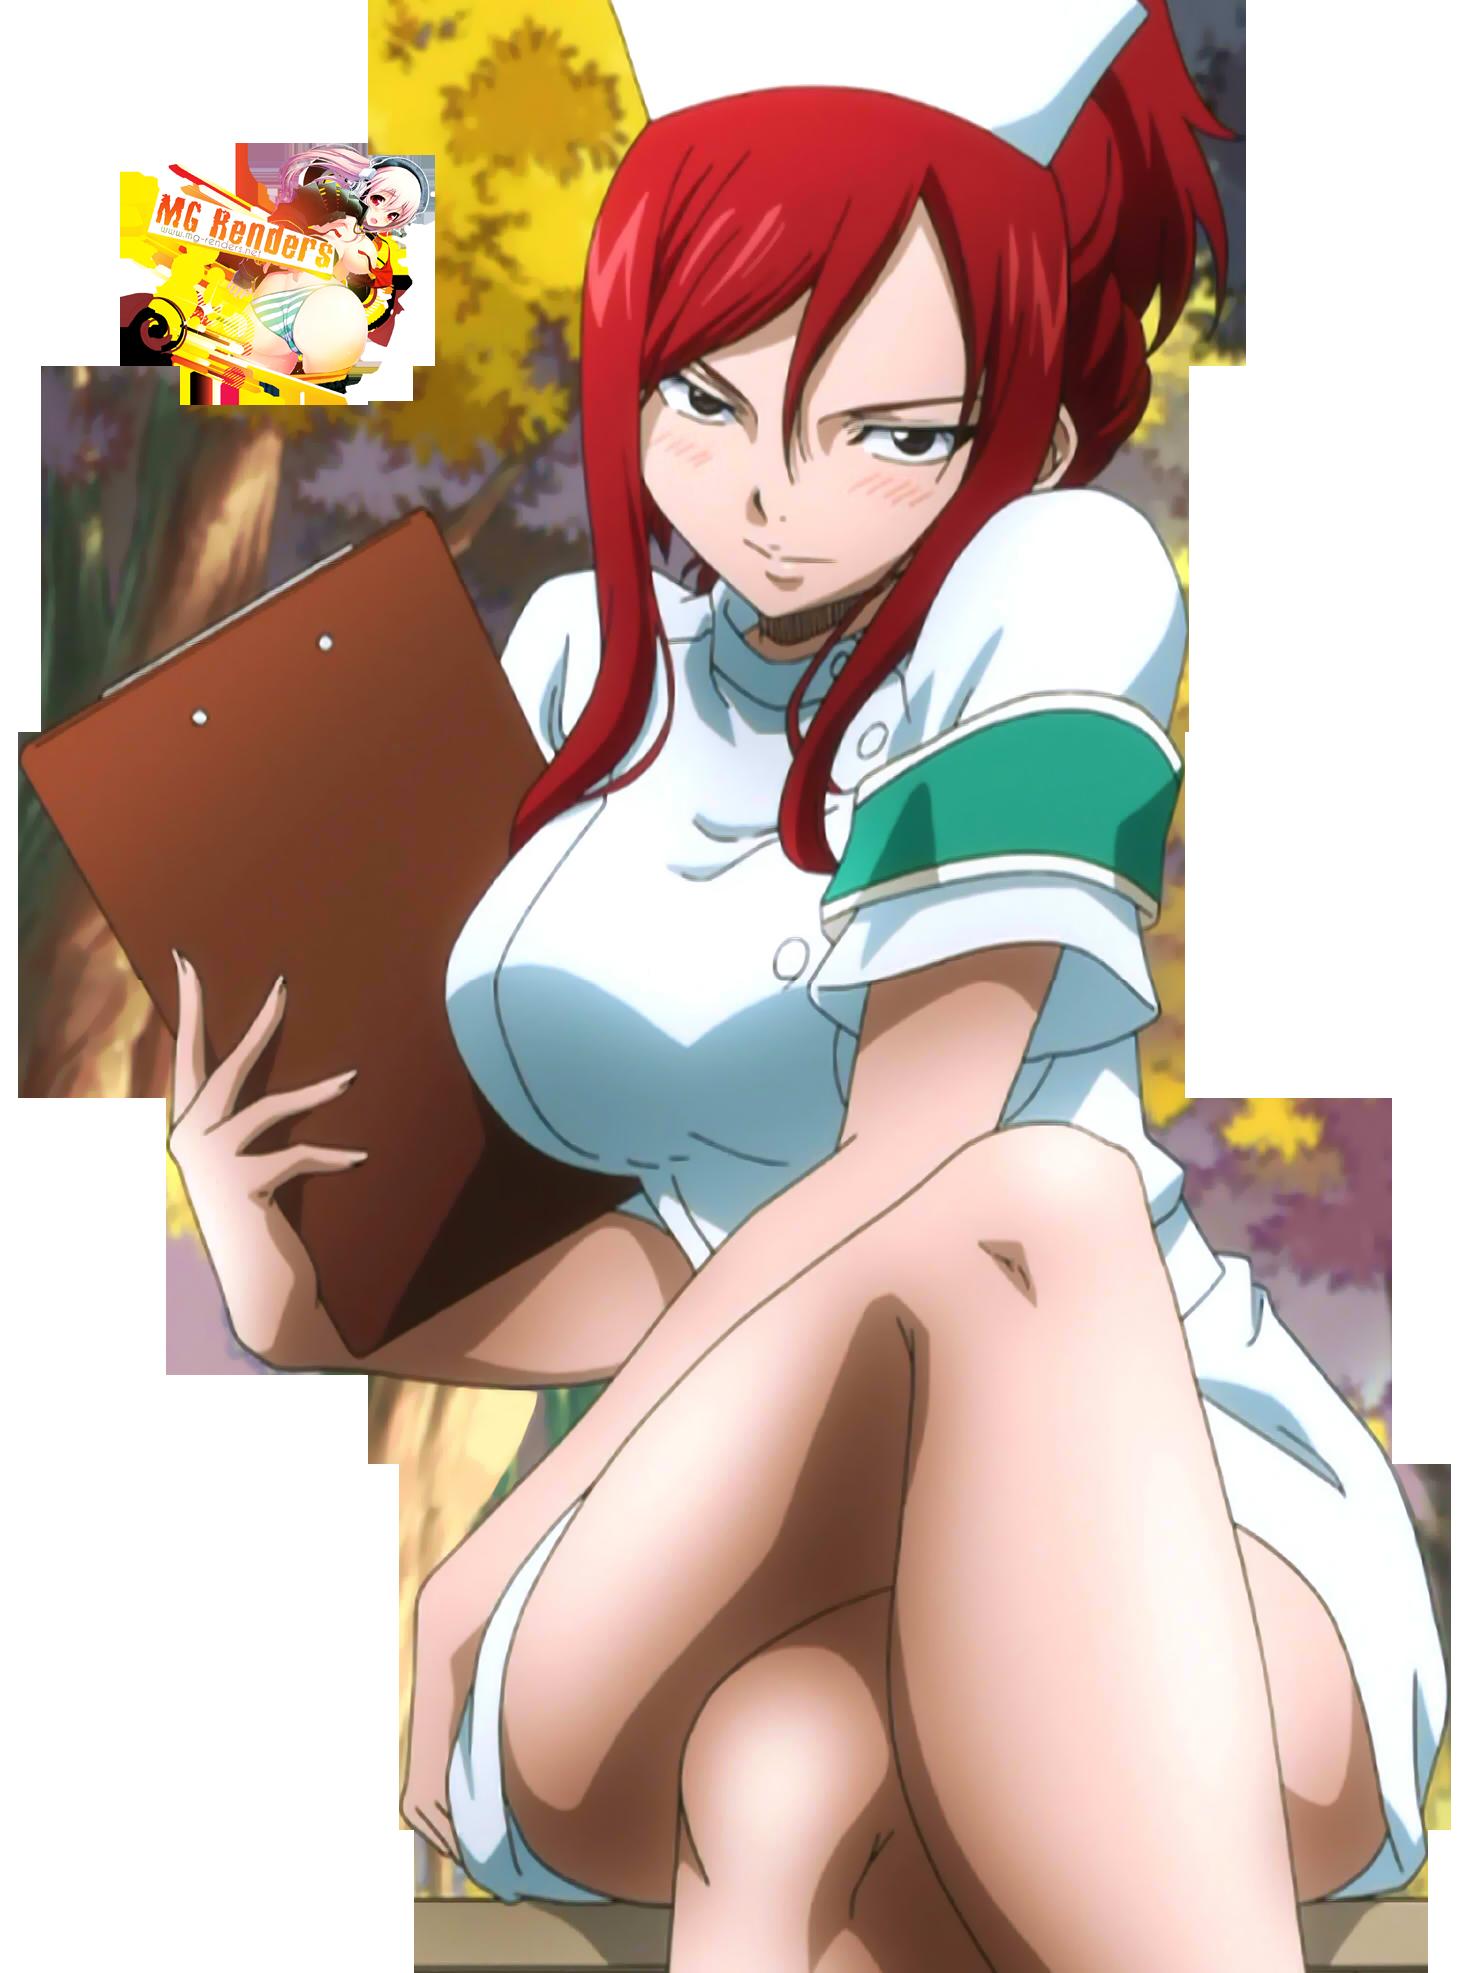 Ezra Hentai regarding fairy tail - erza scarlet render 14